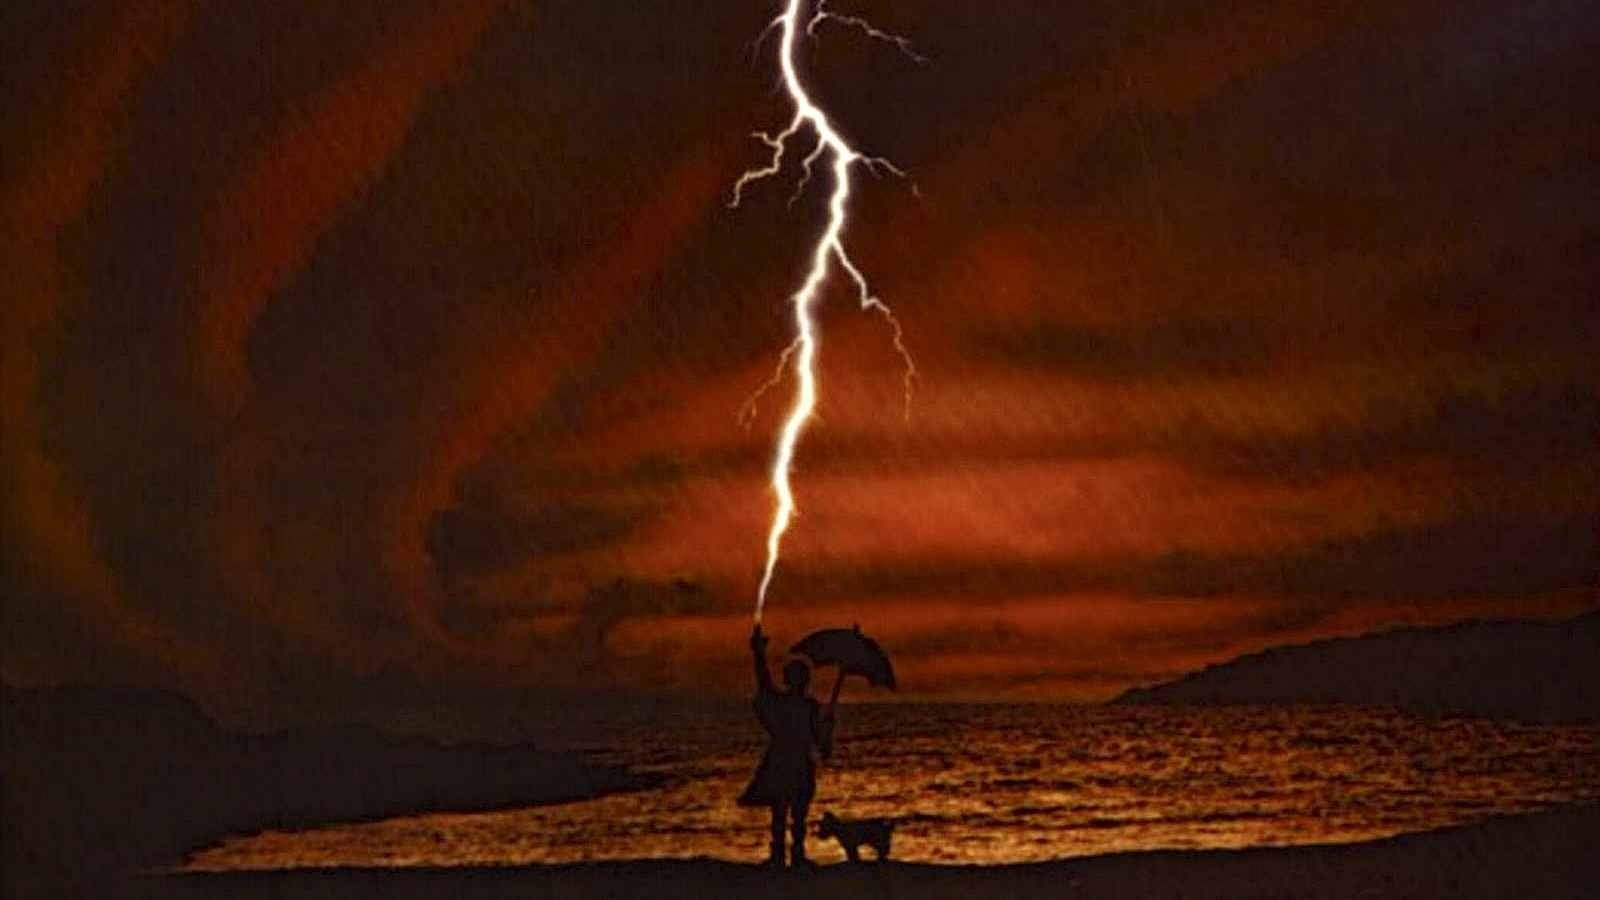 Буря смотреть фото